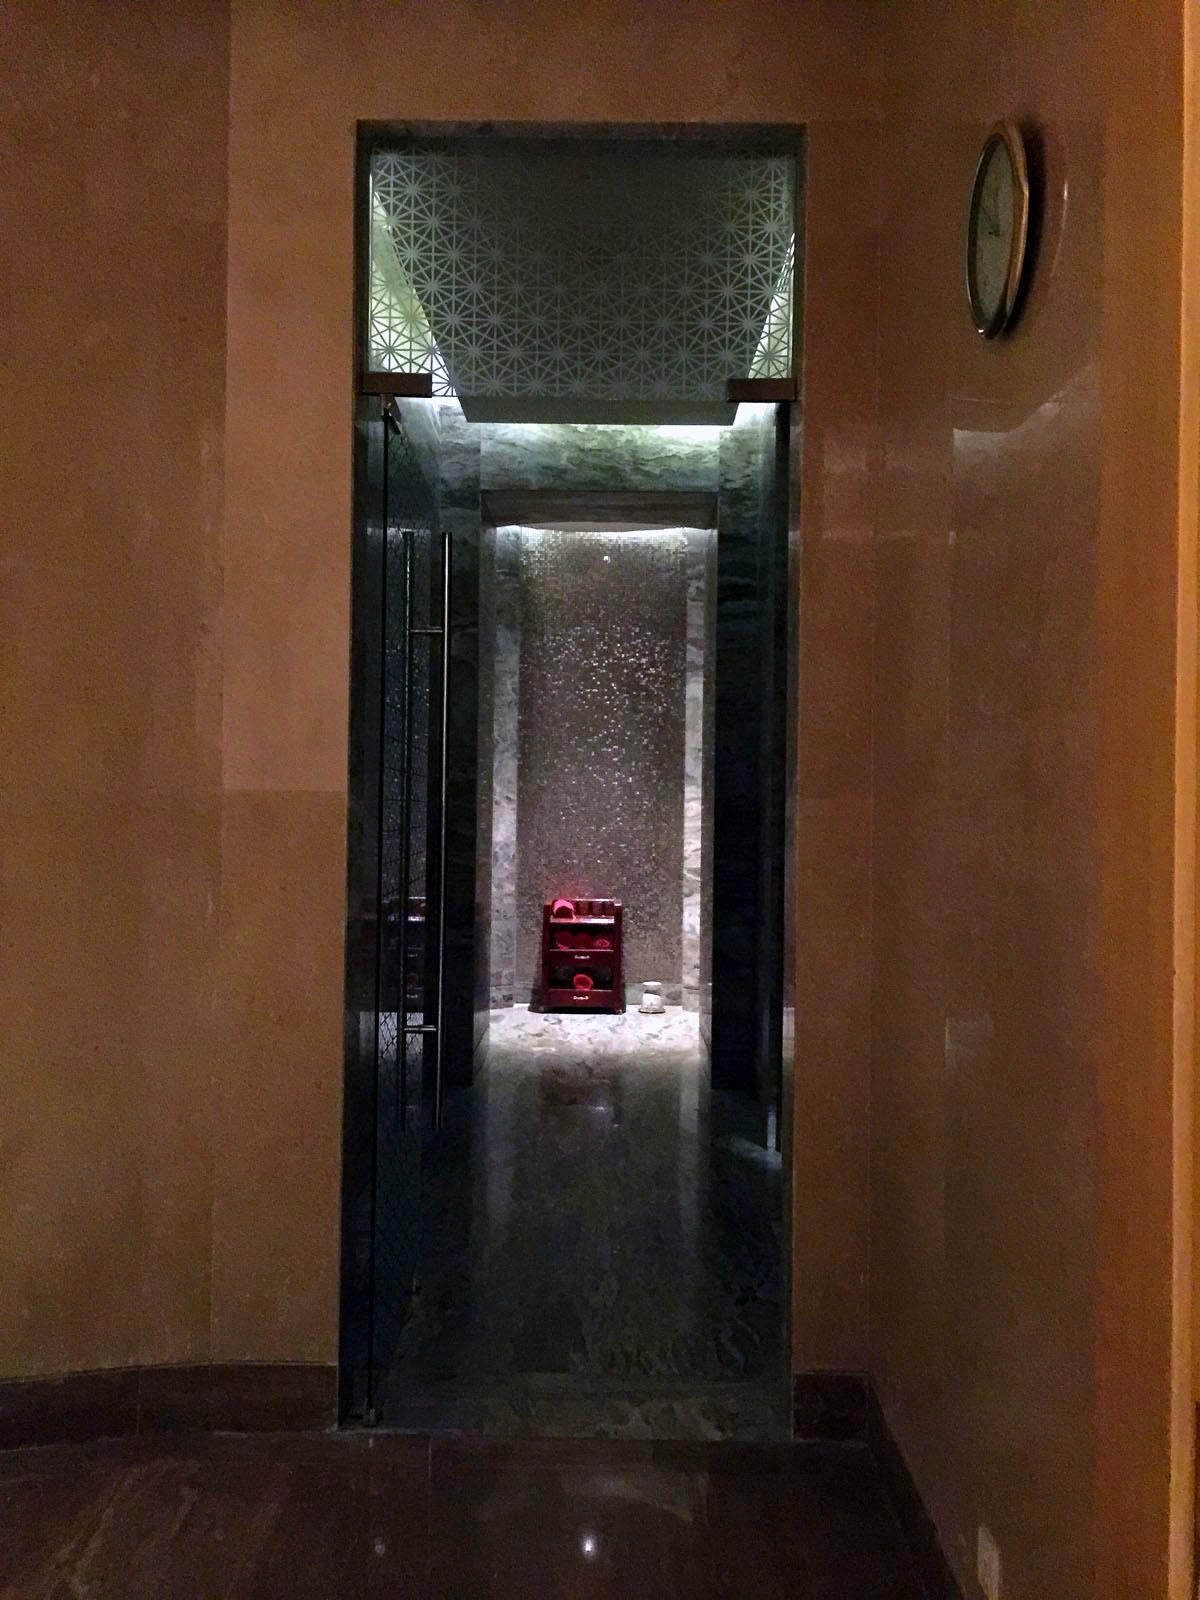 INDIEN_ITC_Grand_Chola_Hotel_Chennai_FINEST-onTour_1900.jpg